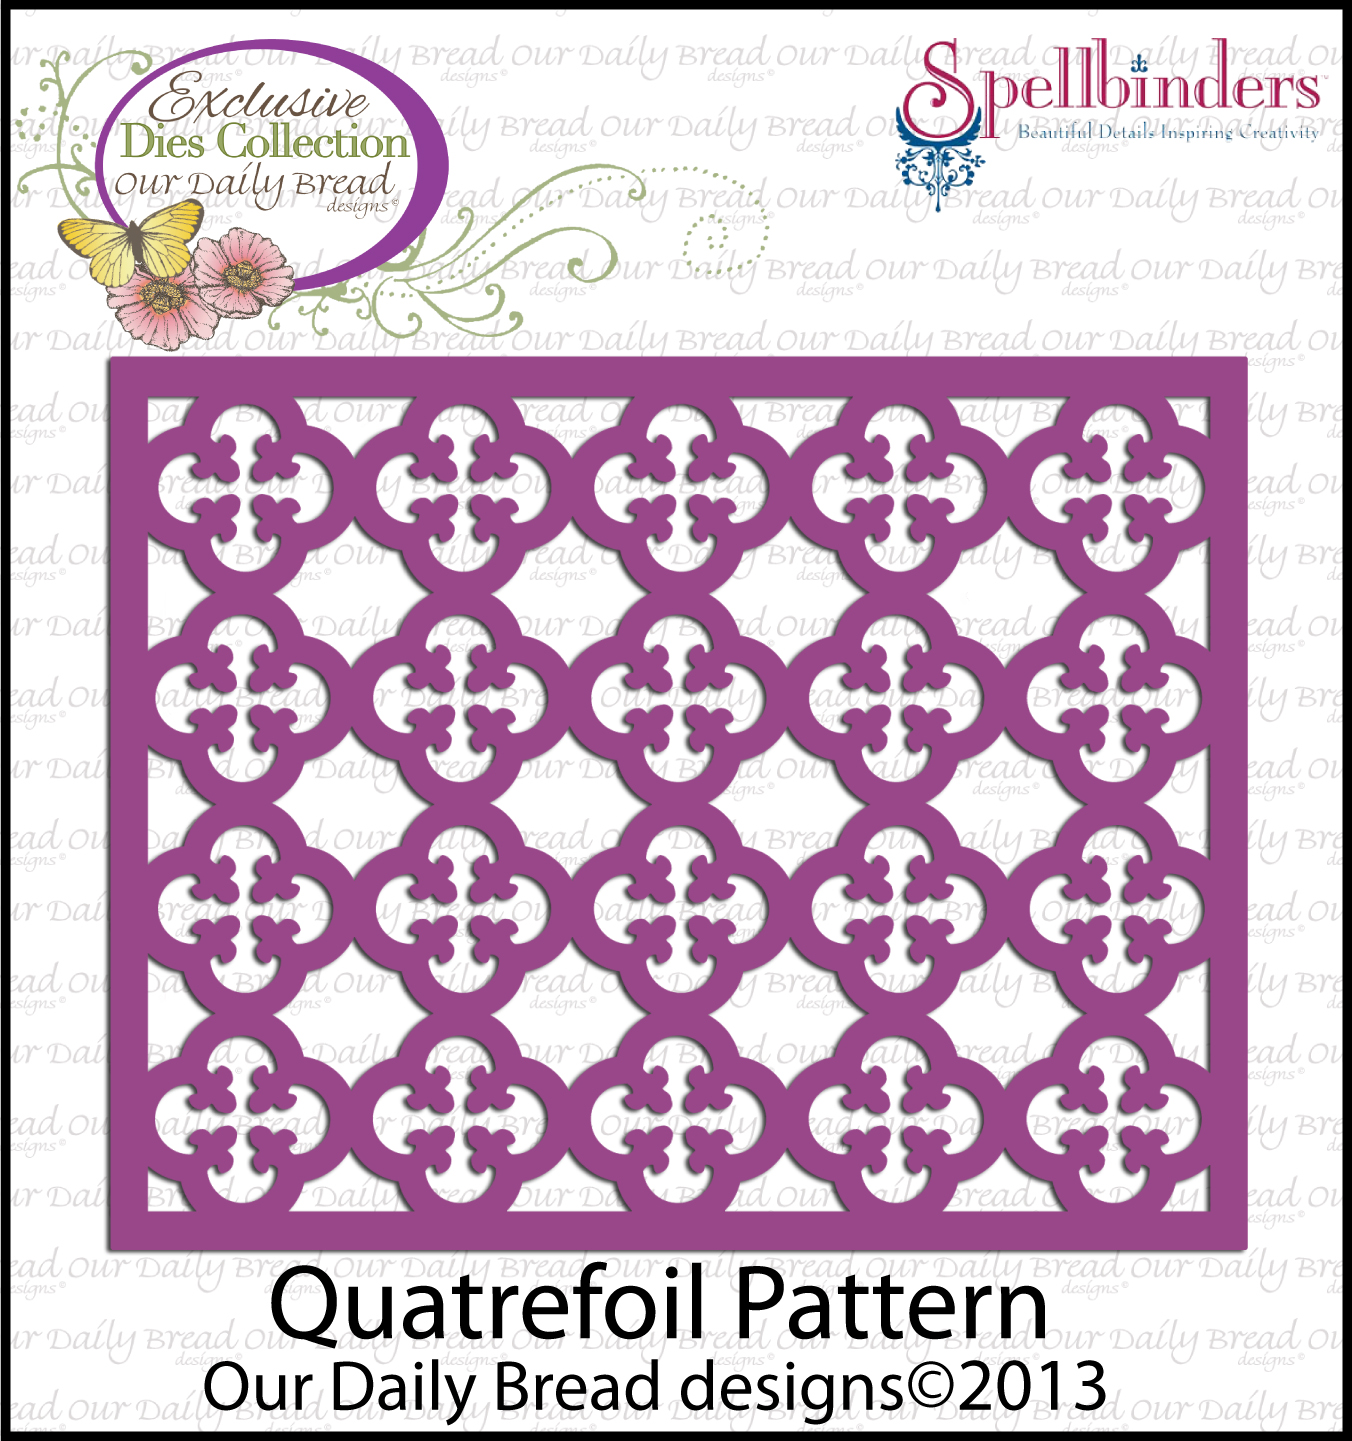 http://www.ourdailybreaddesigns.com/index.php/quatrefoil-pattern-die.html